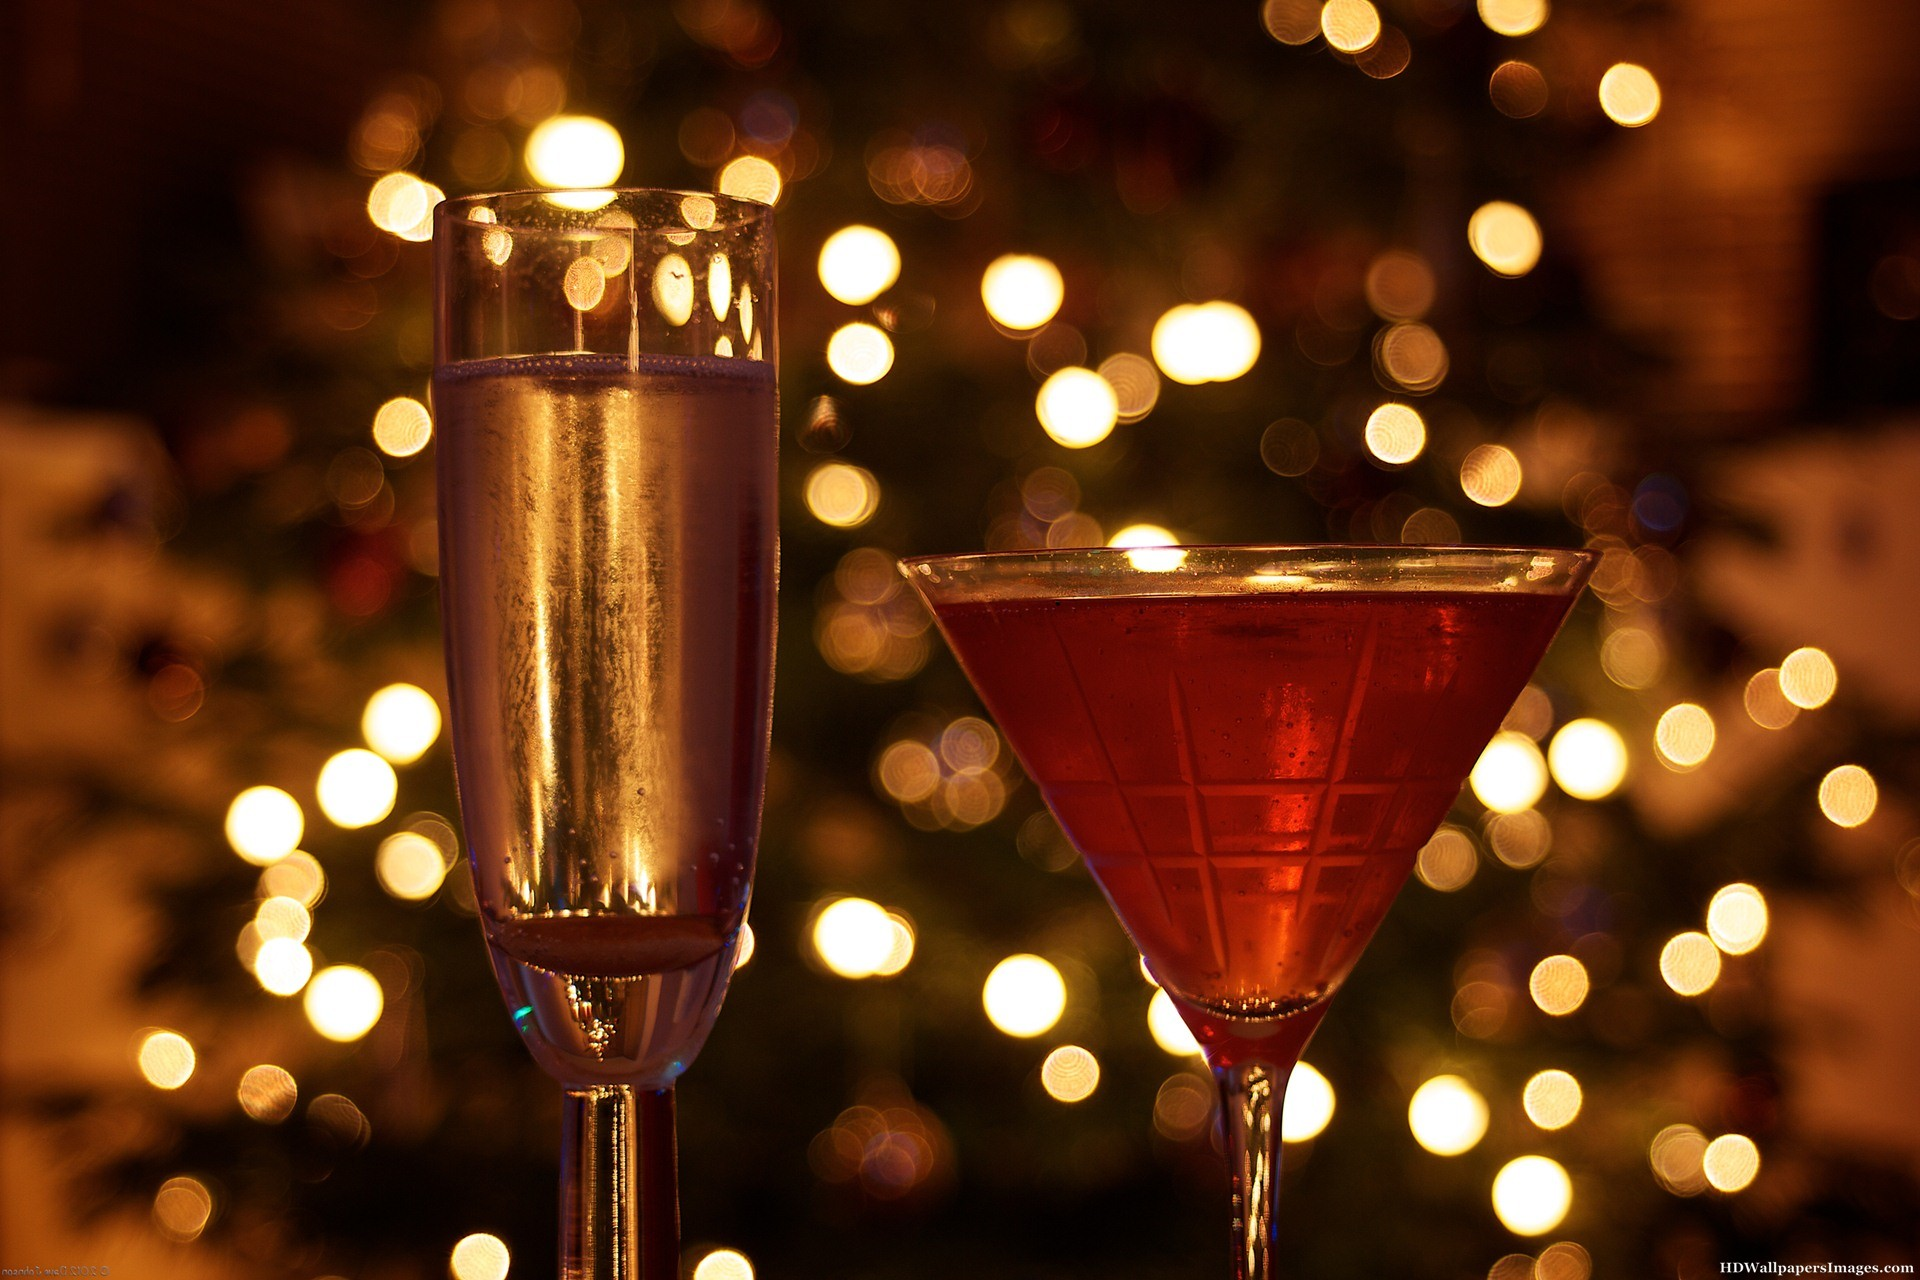 Taças_Champagne_Boas_festas- (4)